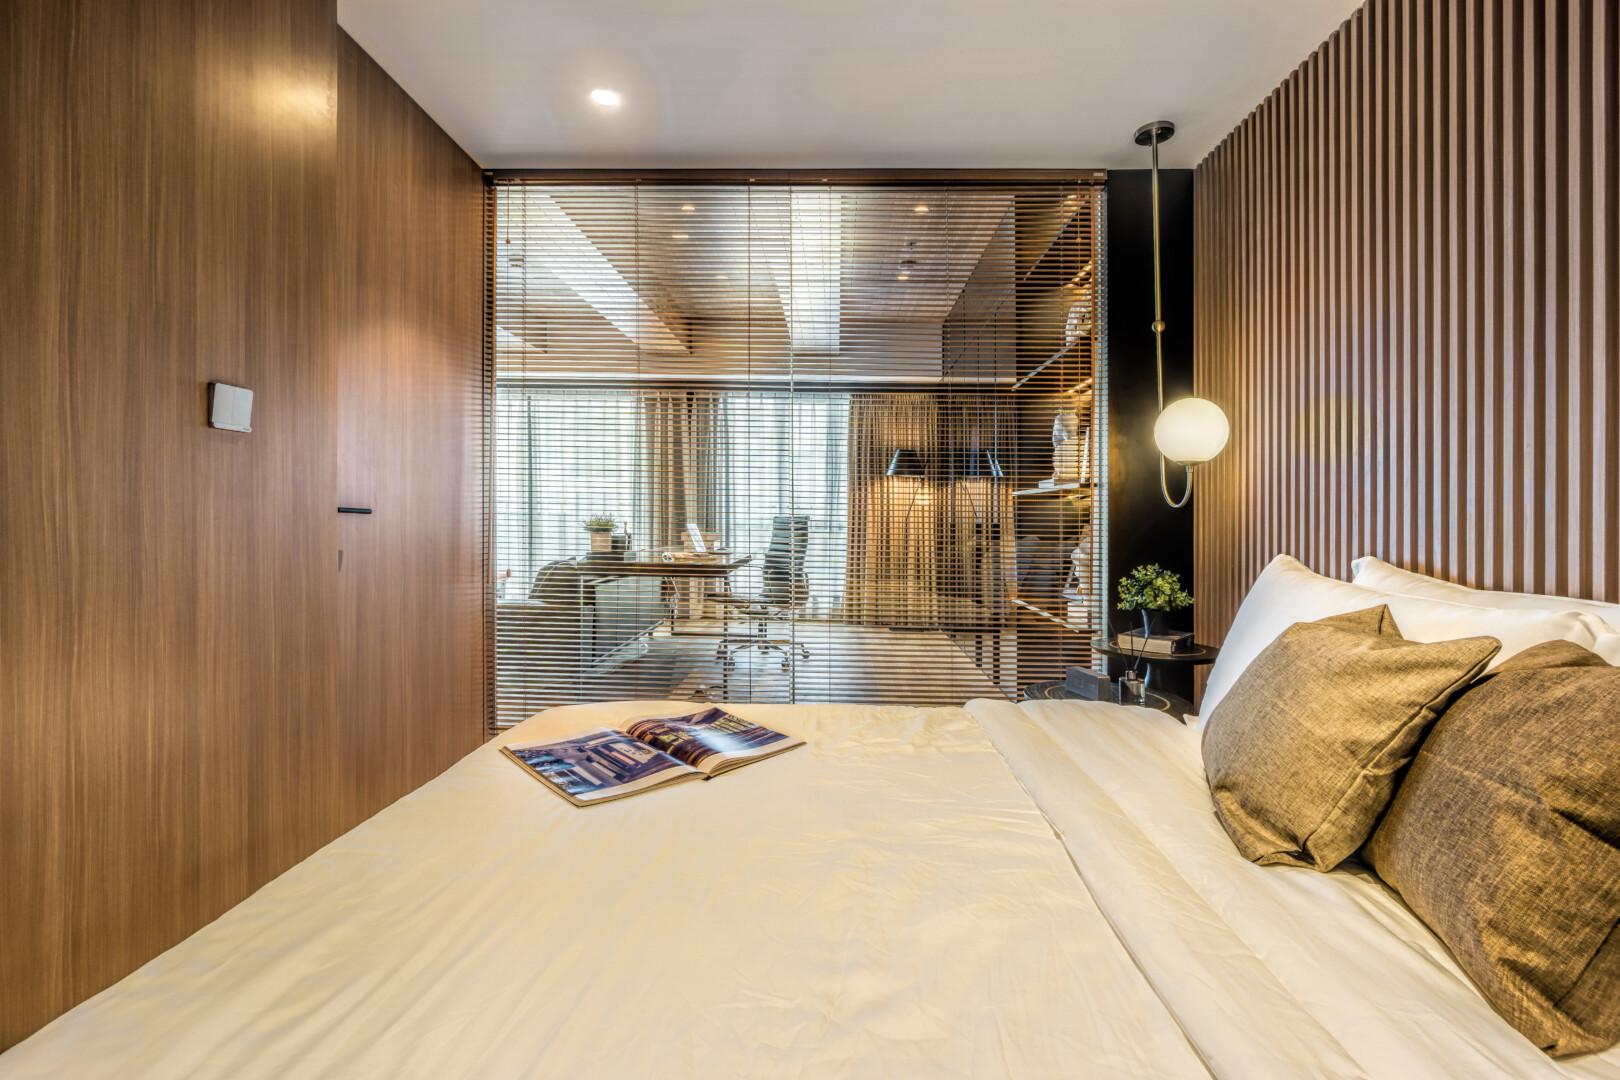 Room 09 - Image 3